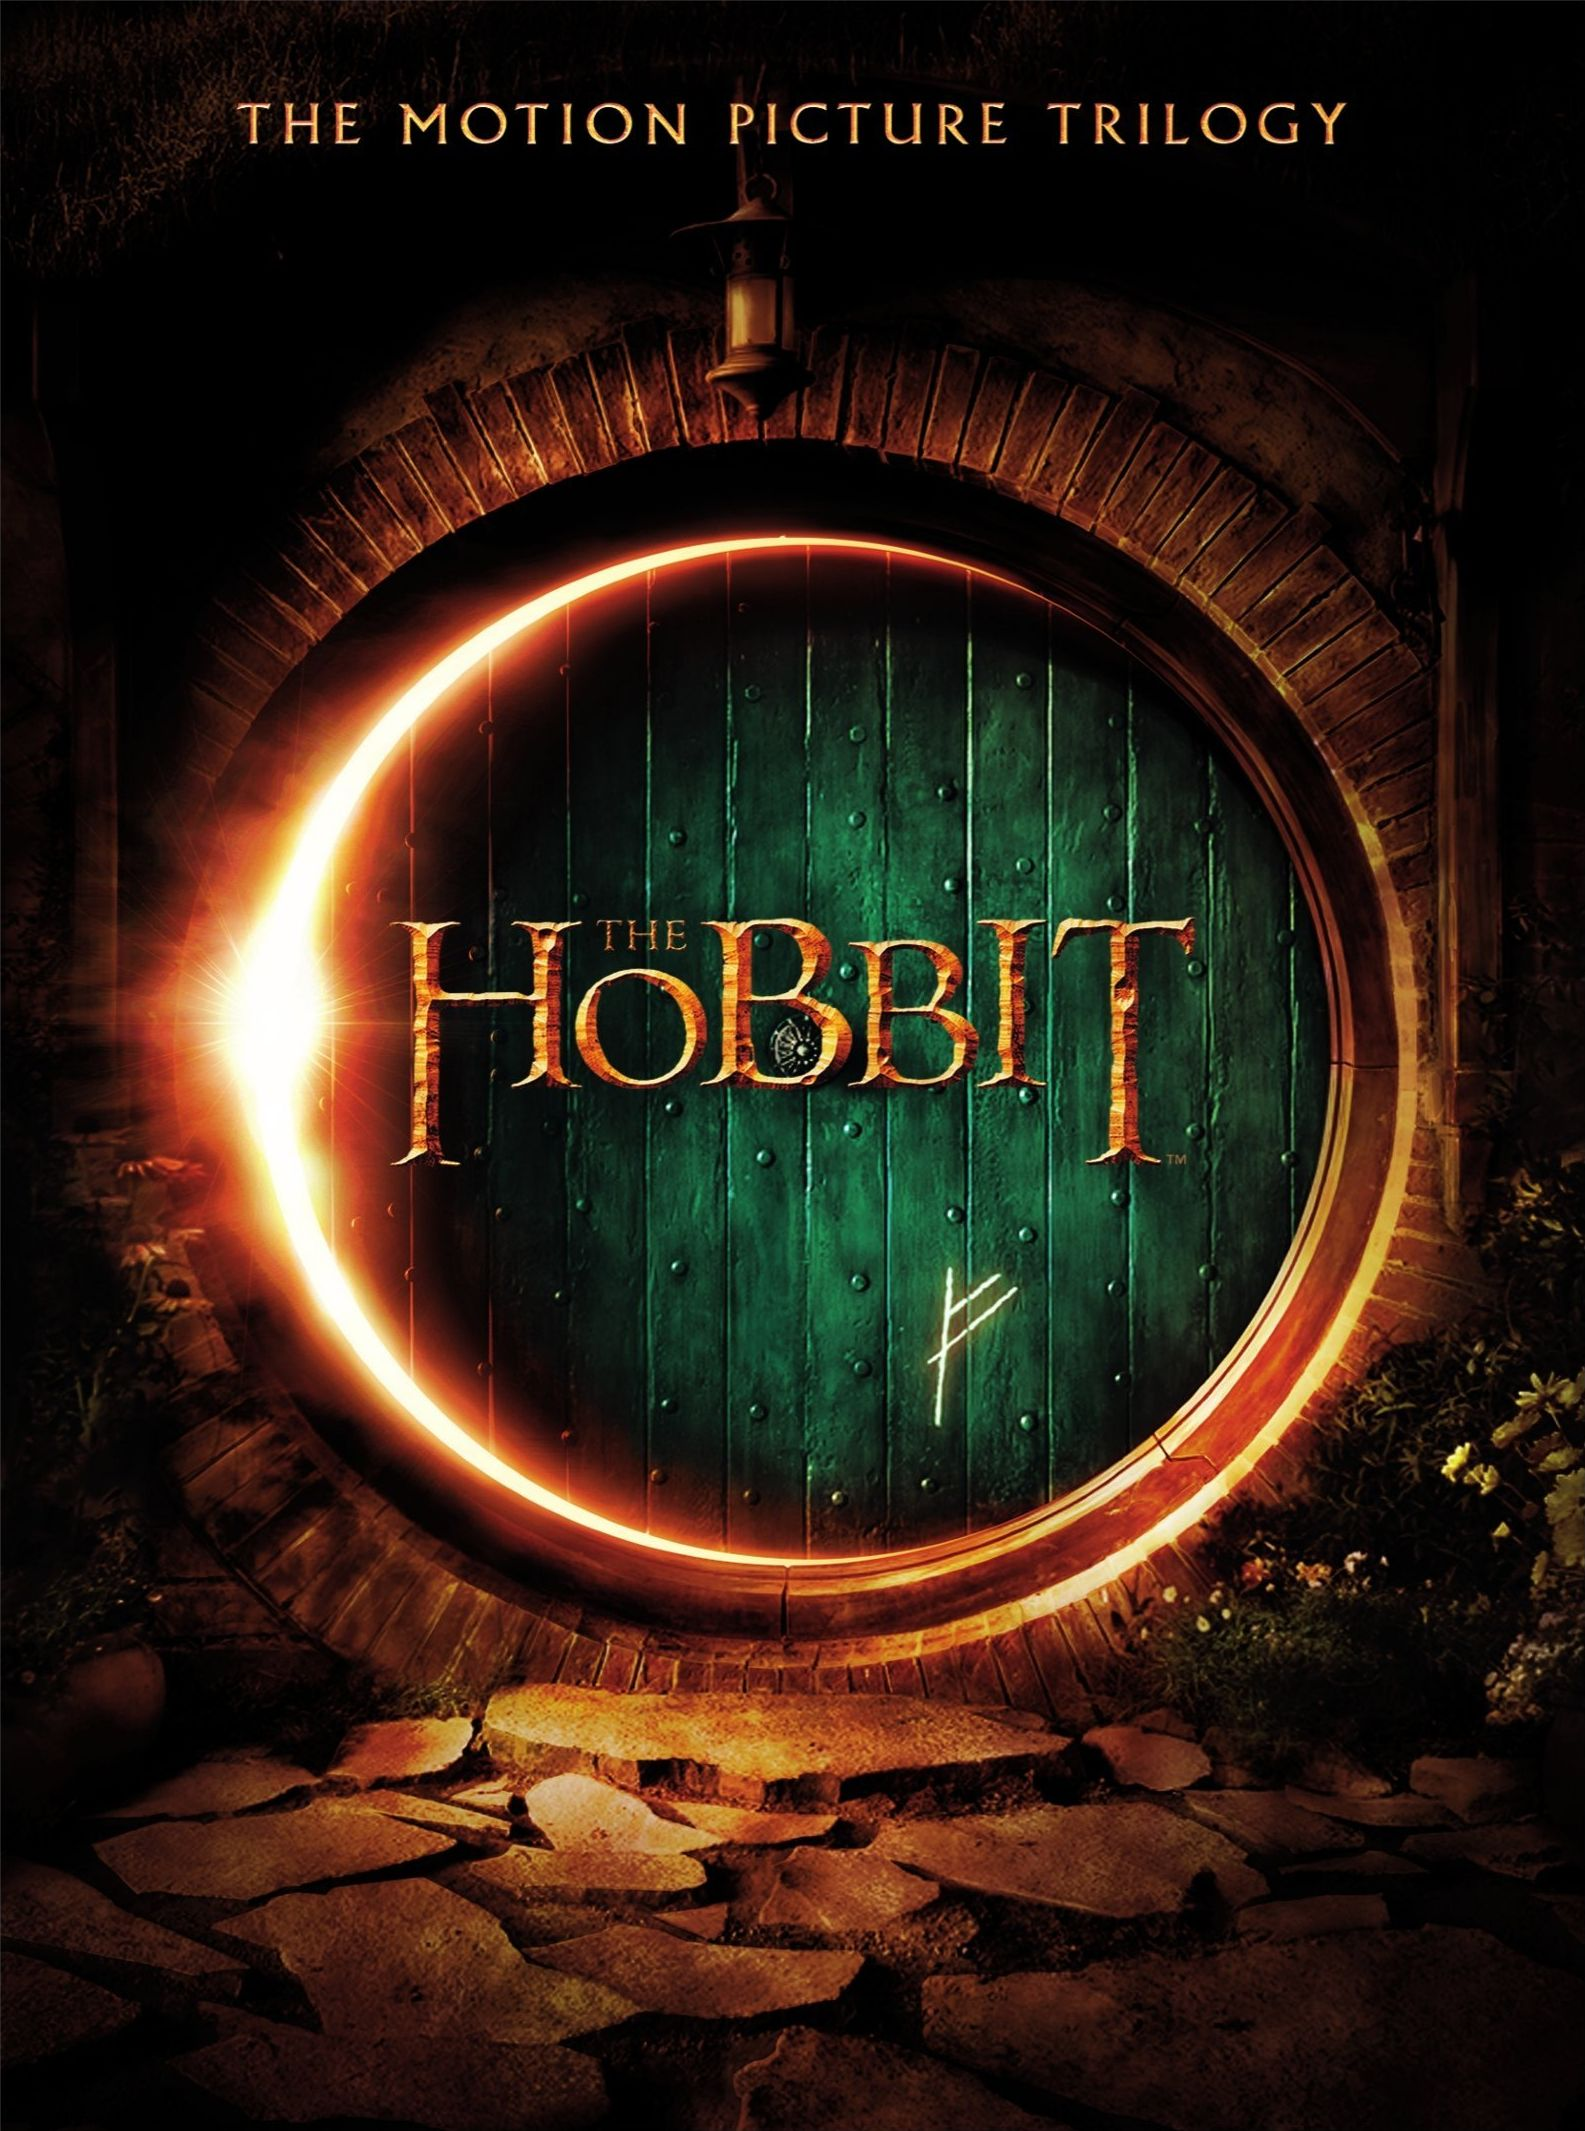 The Hobbit film trilogy